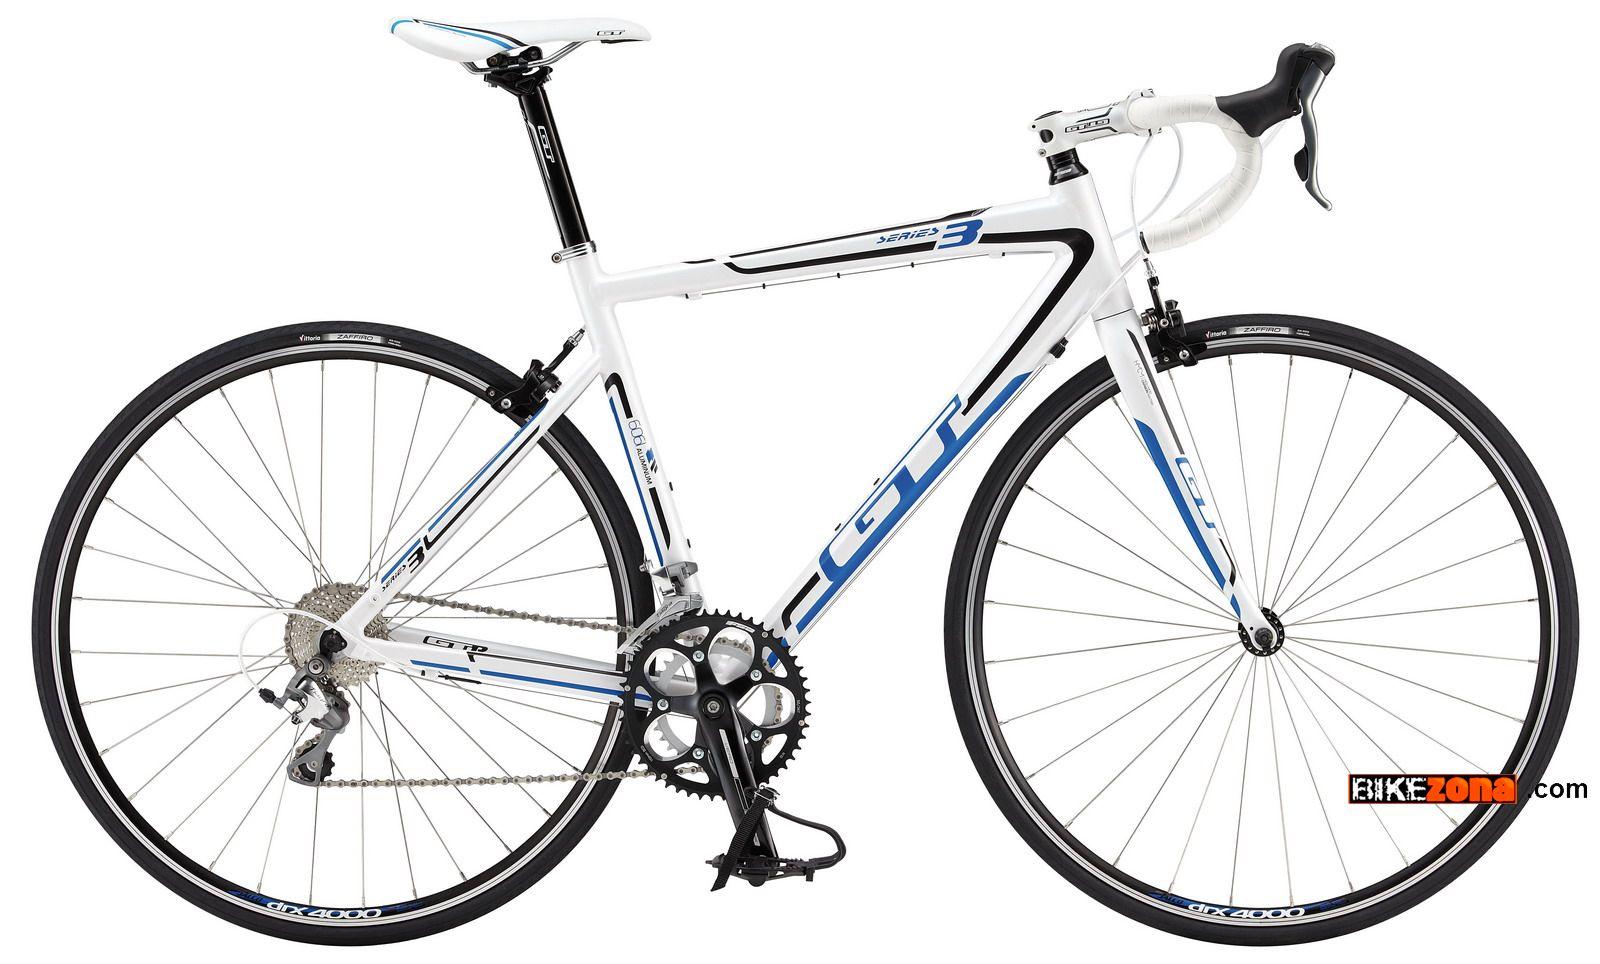 GT GTR SERIES 3 (2013) Bicicletas CARRETERA | Catalógo bicicletas en ...